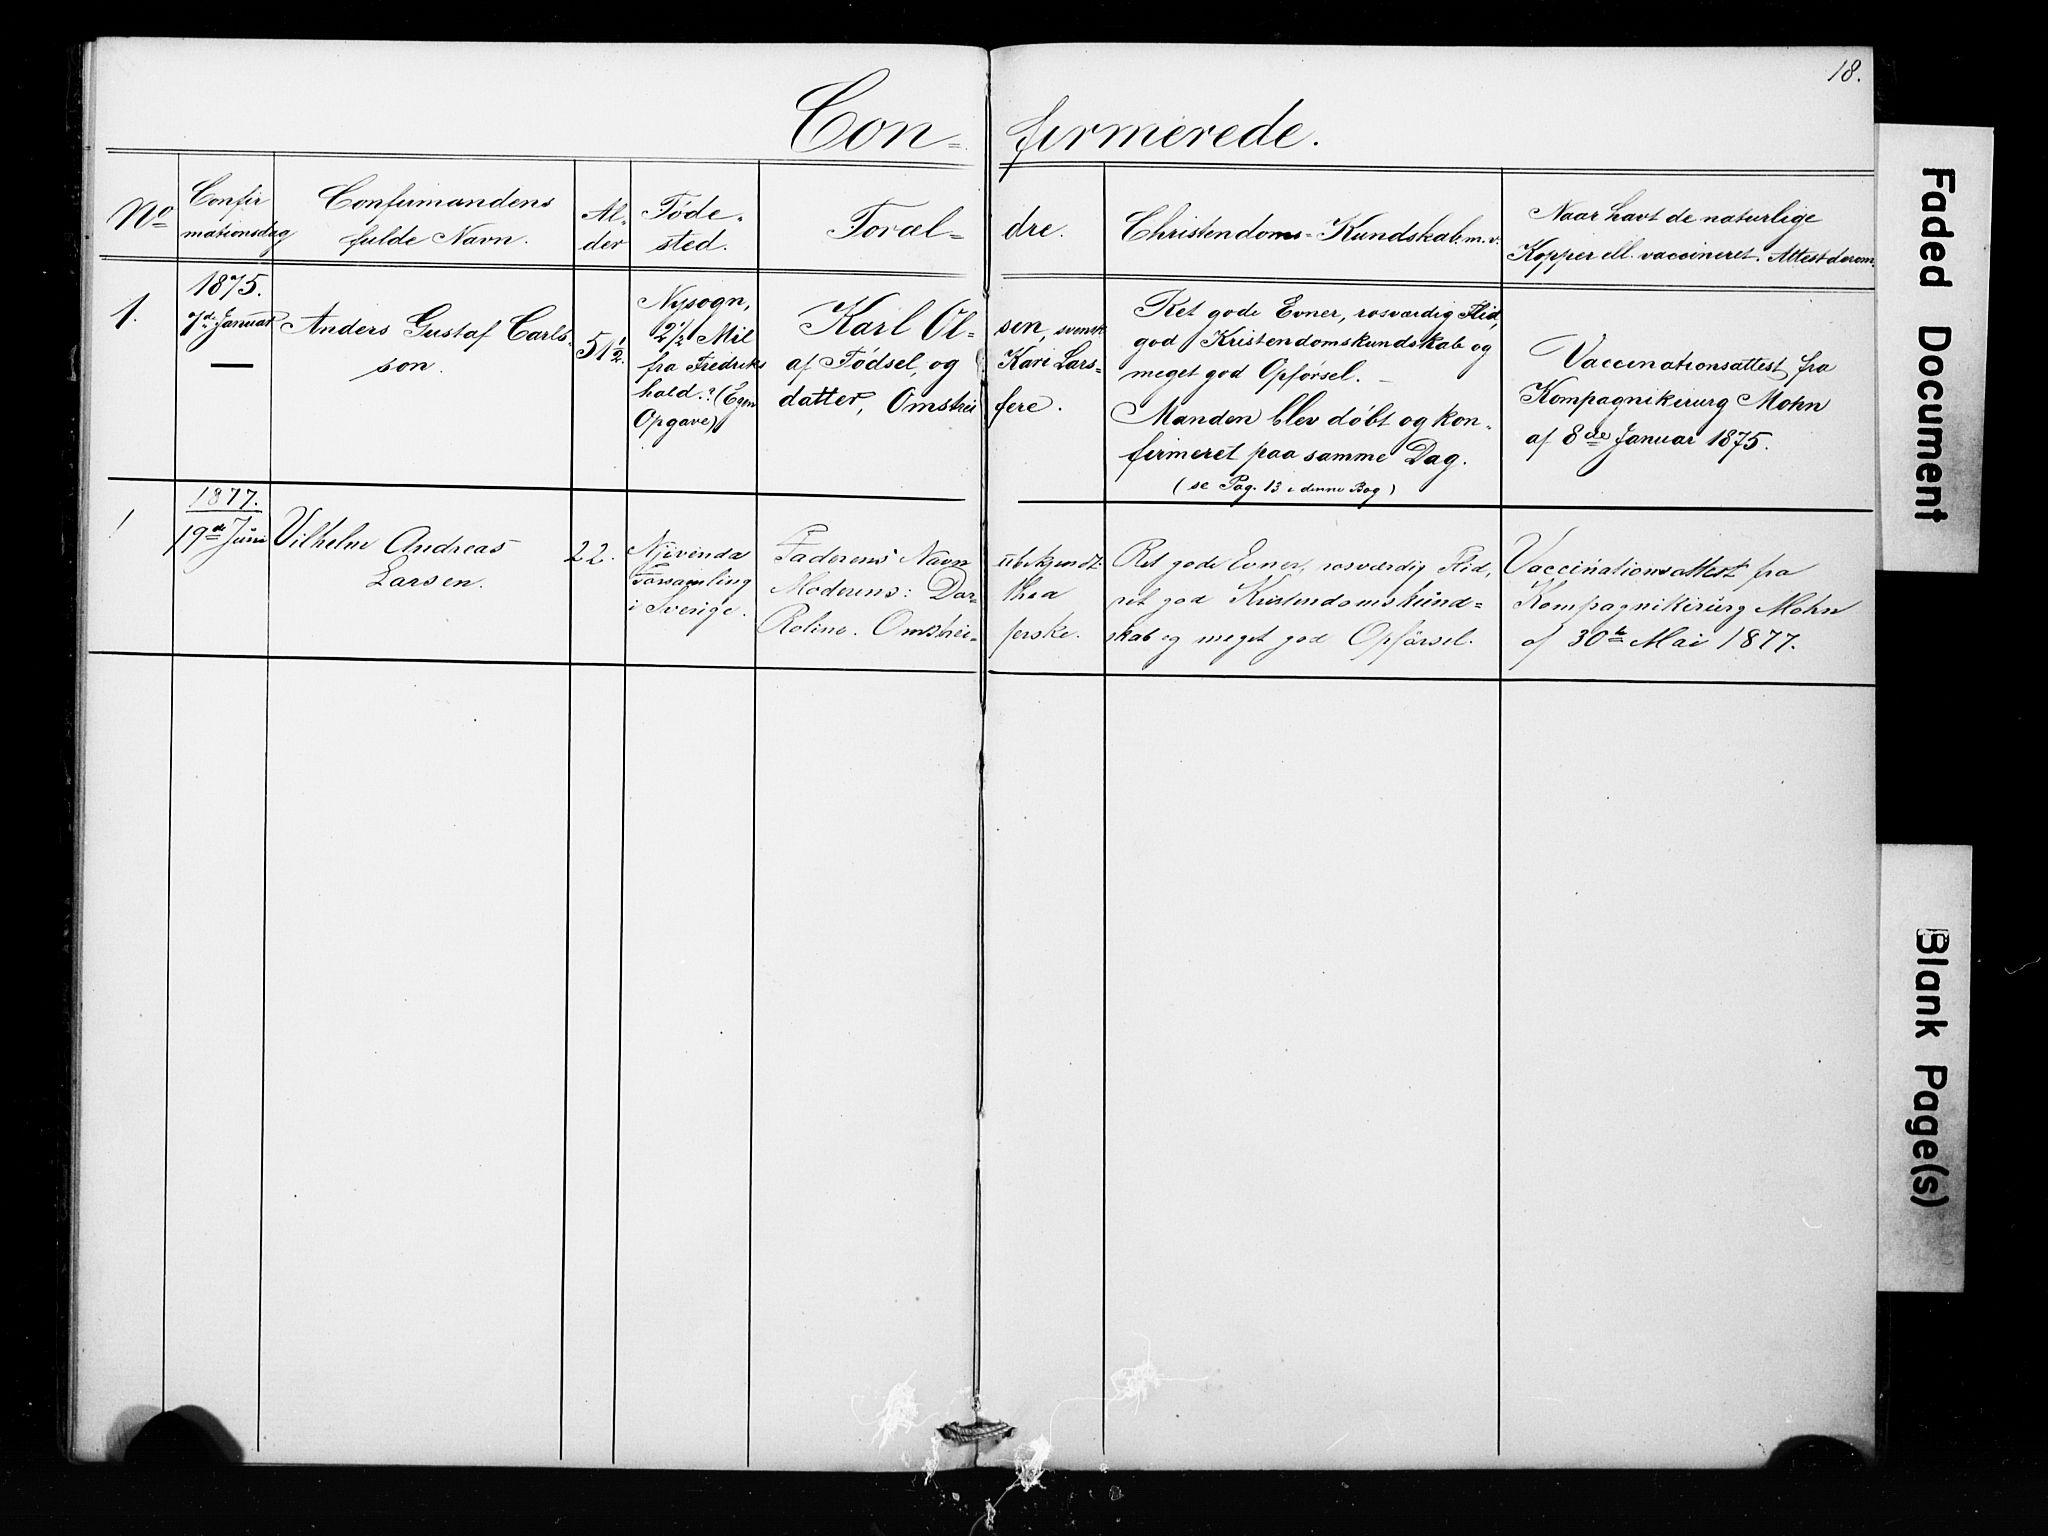 SAB, Bergens strafanstalts sokneprestembete*, Klokkerbok nr. A 1, 1874-1884, s. 18